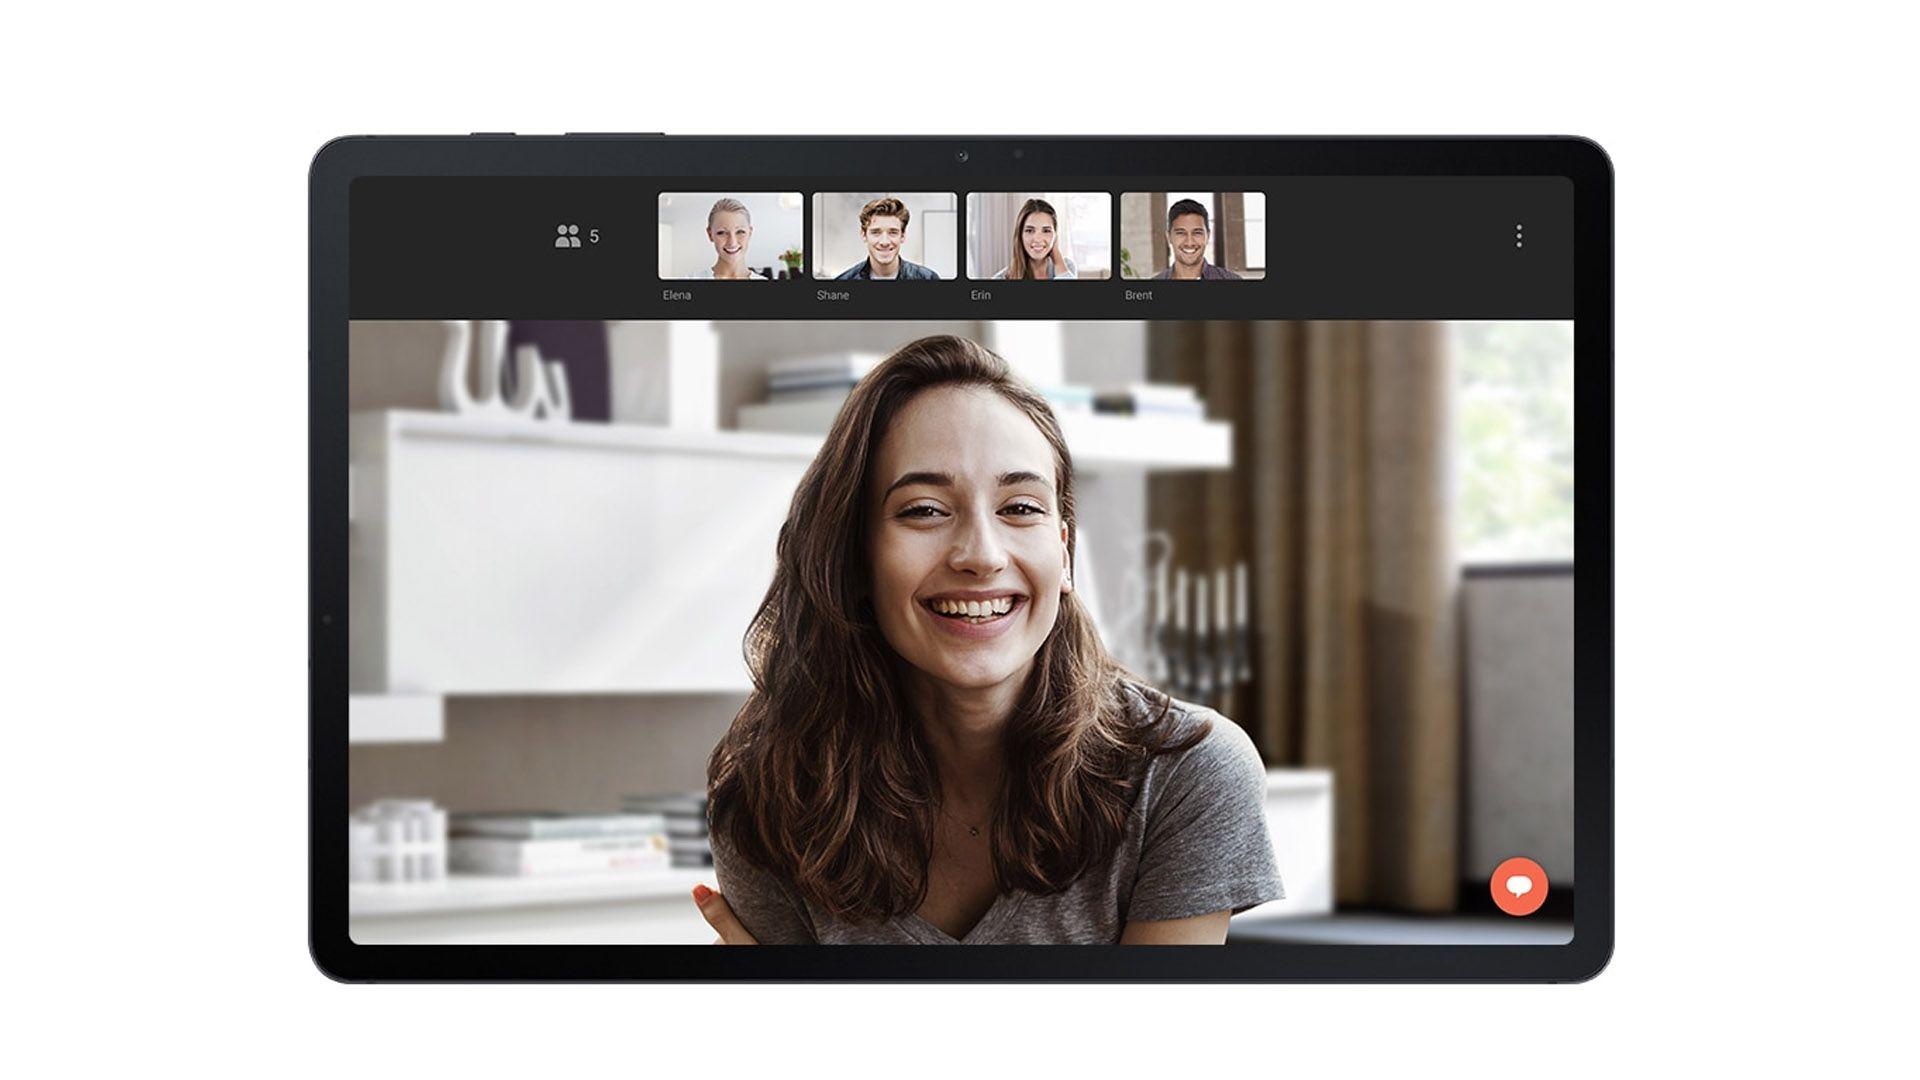 Mulher fazendo videochamada no Samsung Galaxy S7 FE